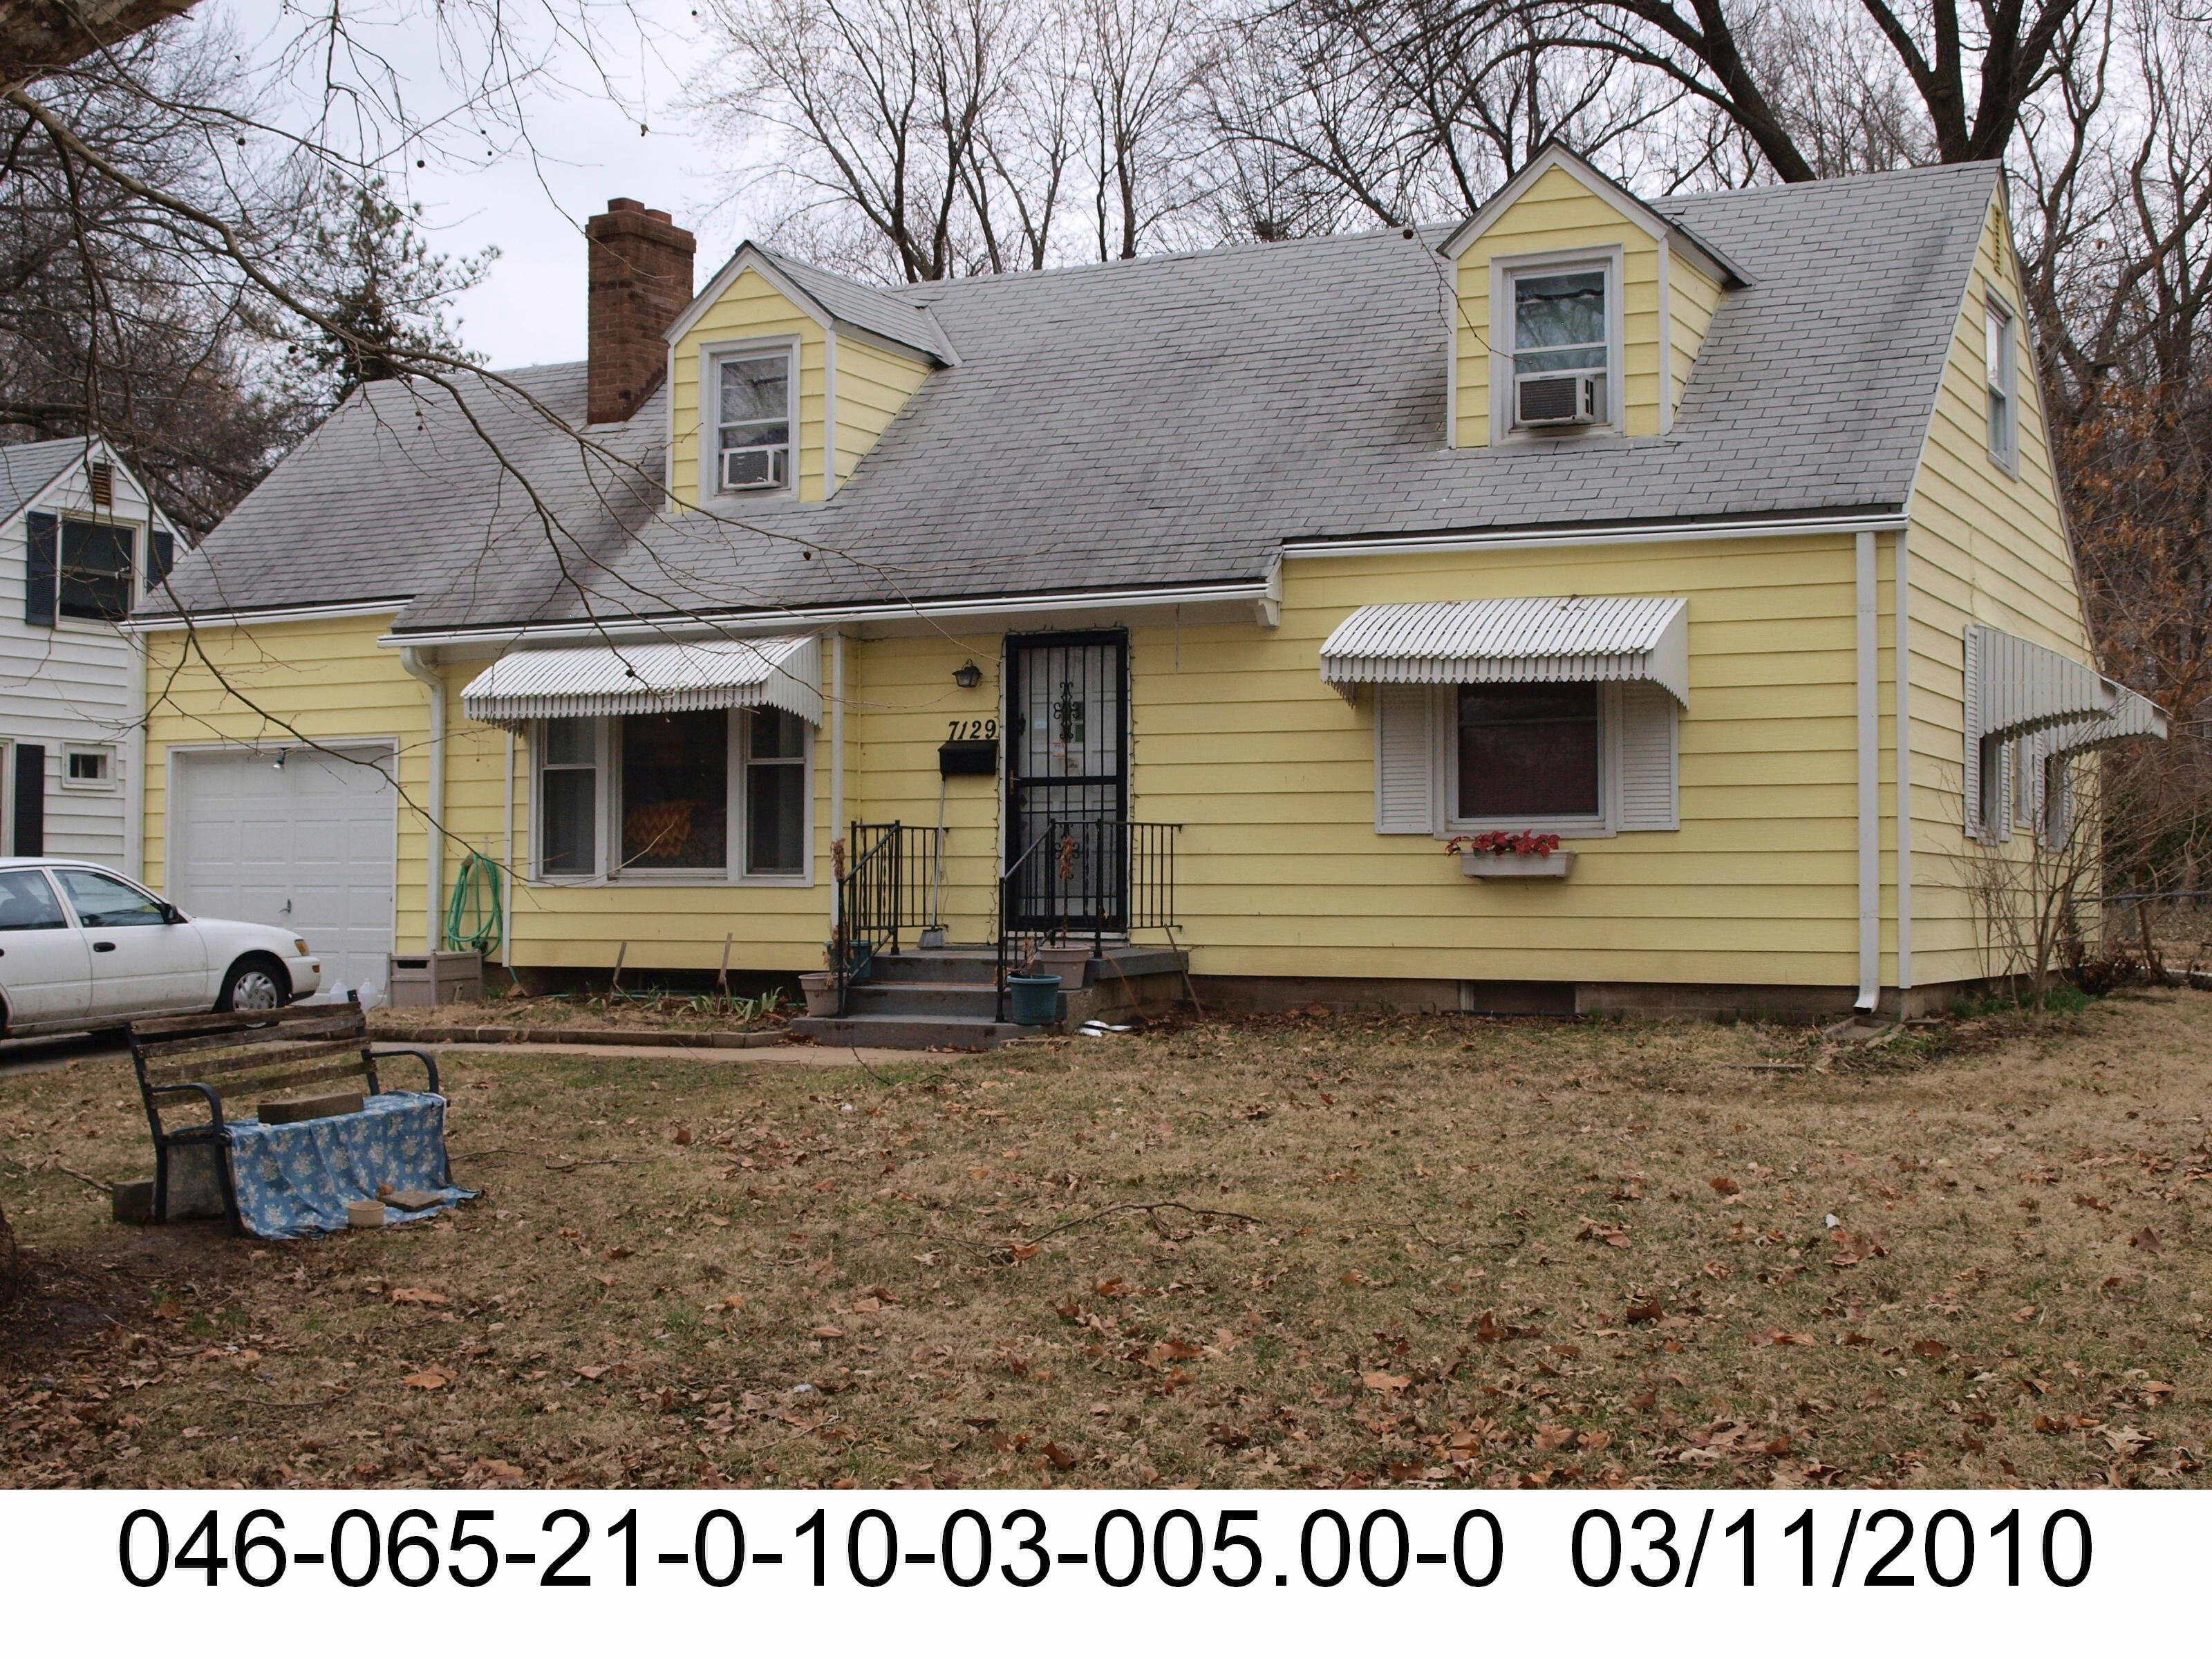 Kansas johnson county prairie village -  164 008 Property In Prairie Village Kansas